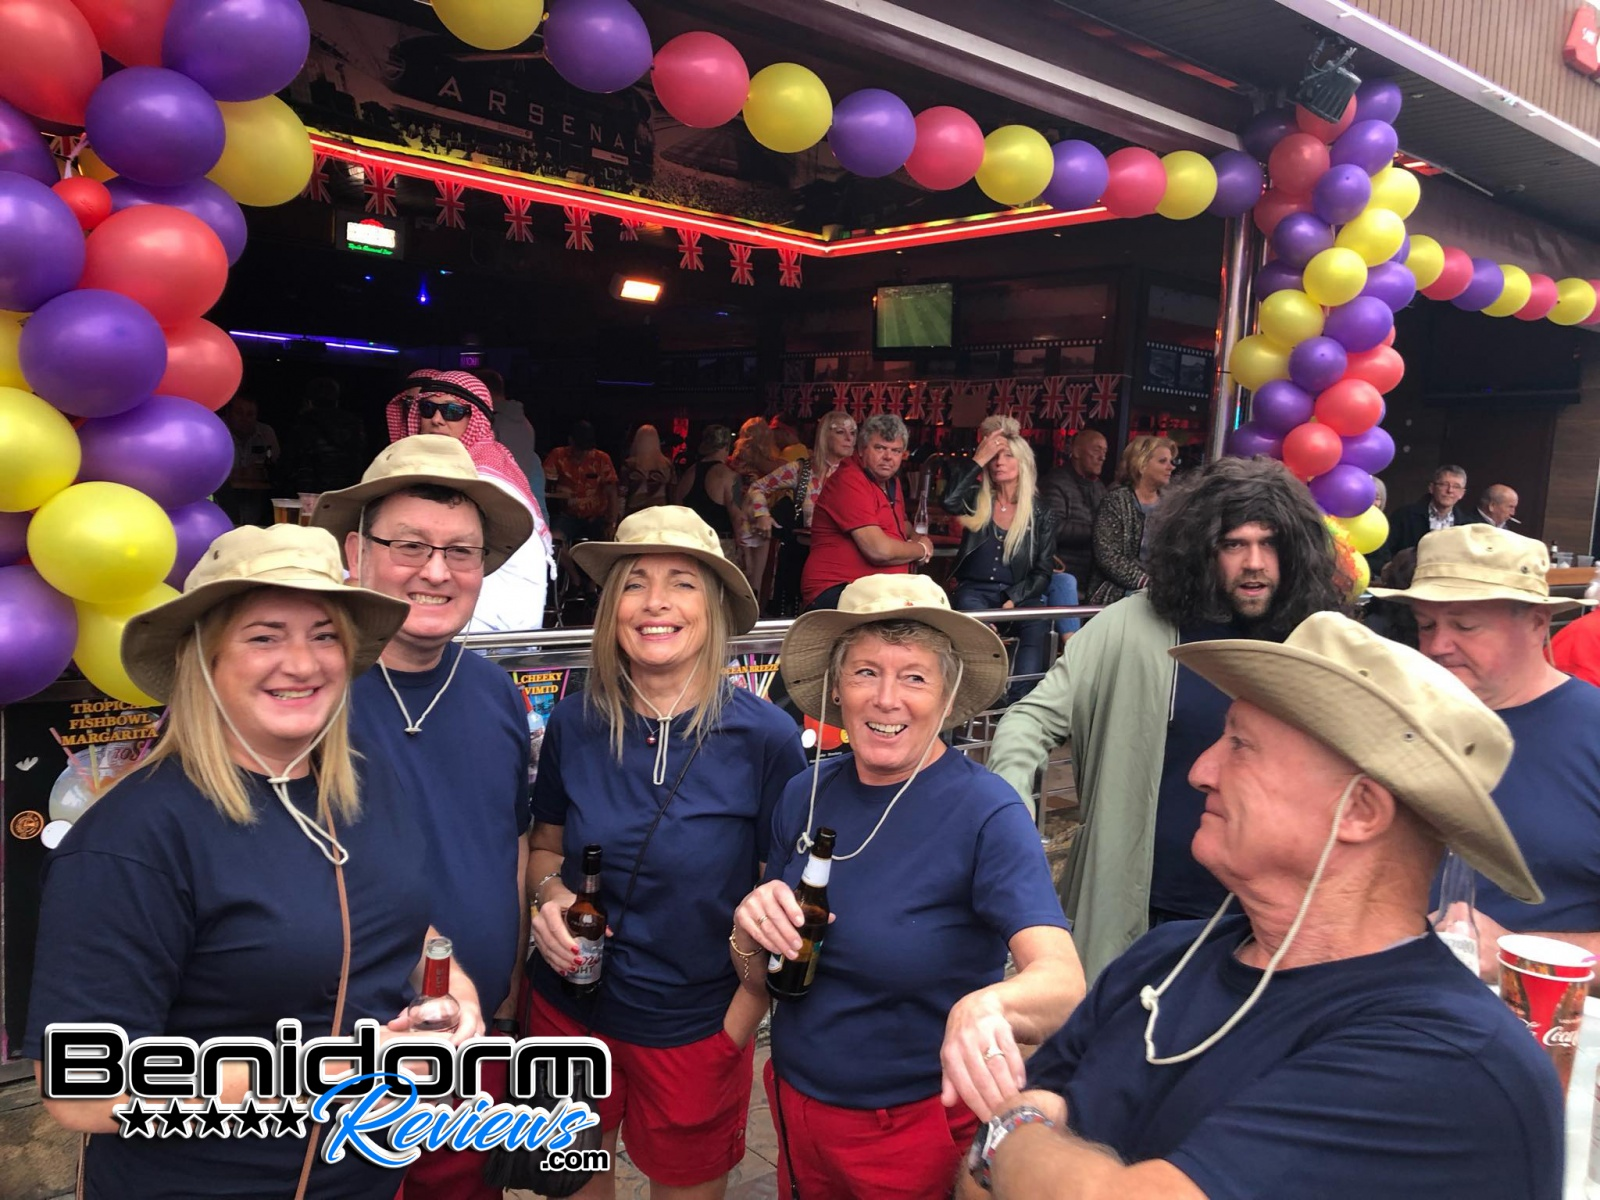 Benidorm-Fiestas-2019-Fancy-Dress-26